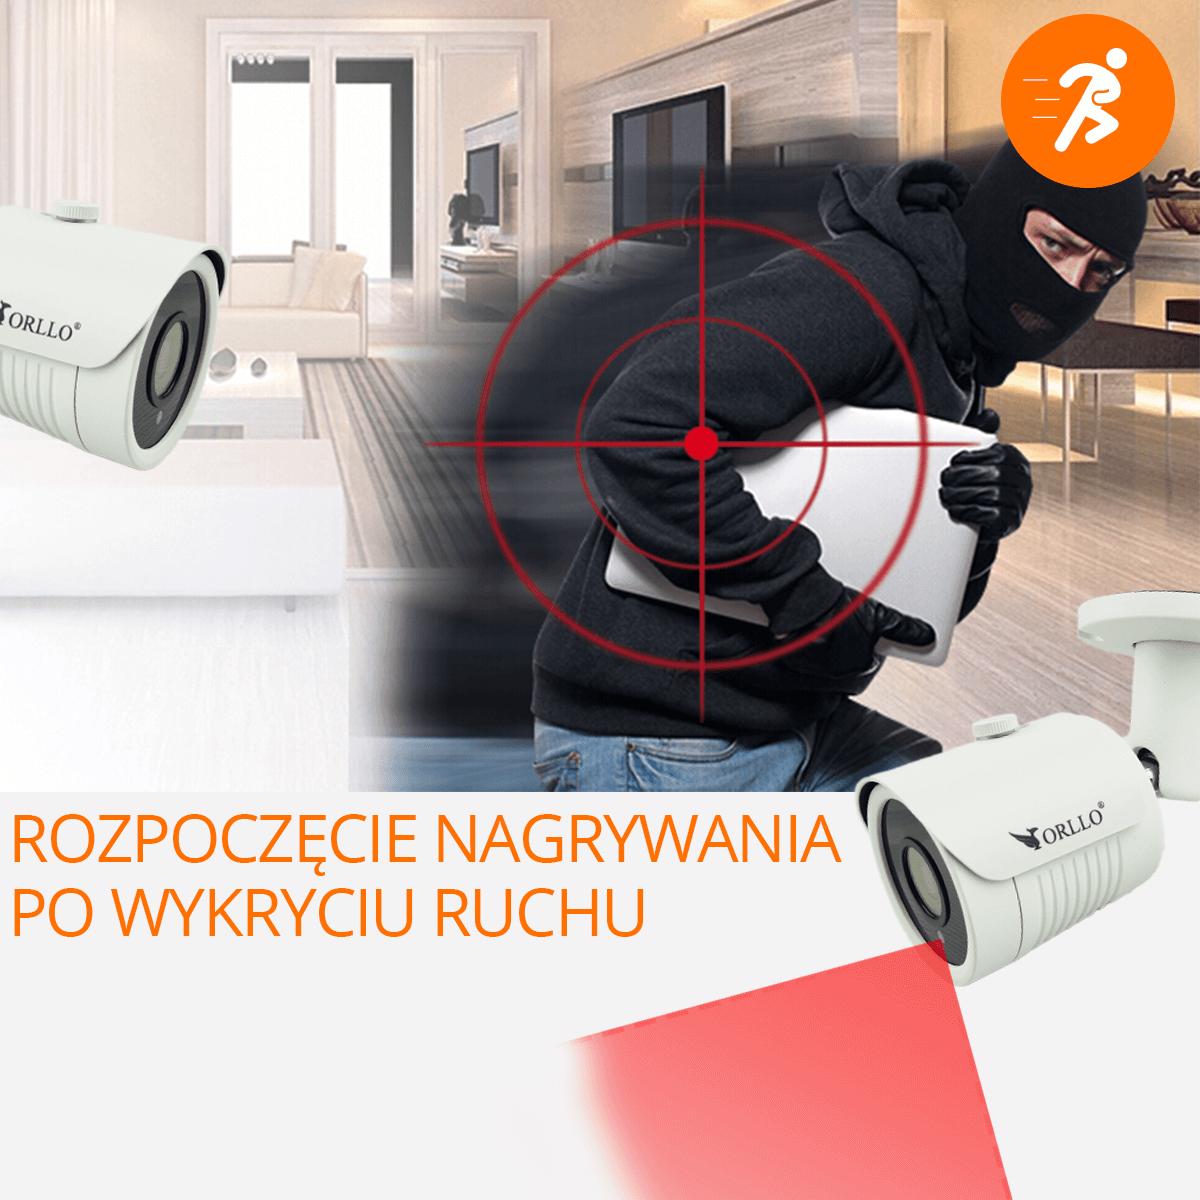 Kamera-CAMSET-czujnik-ruchu-orllo-pl